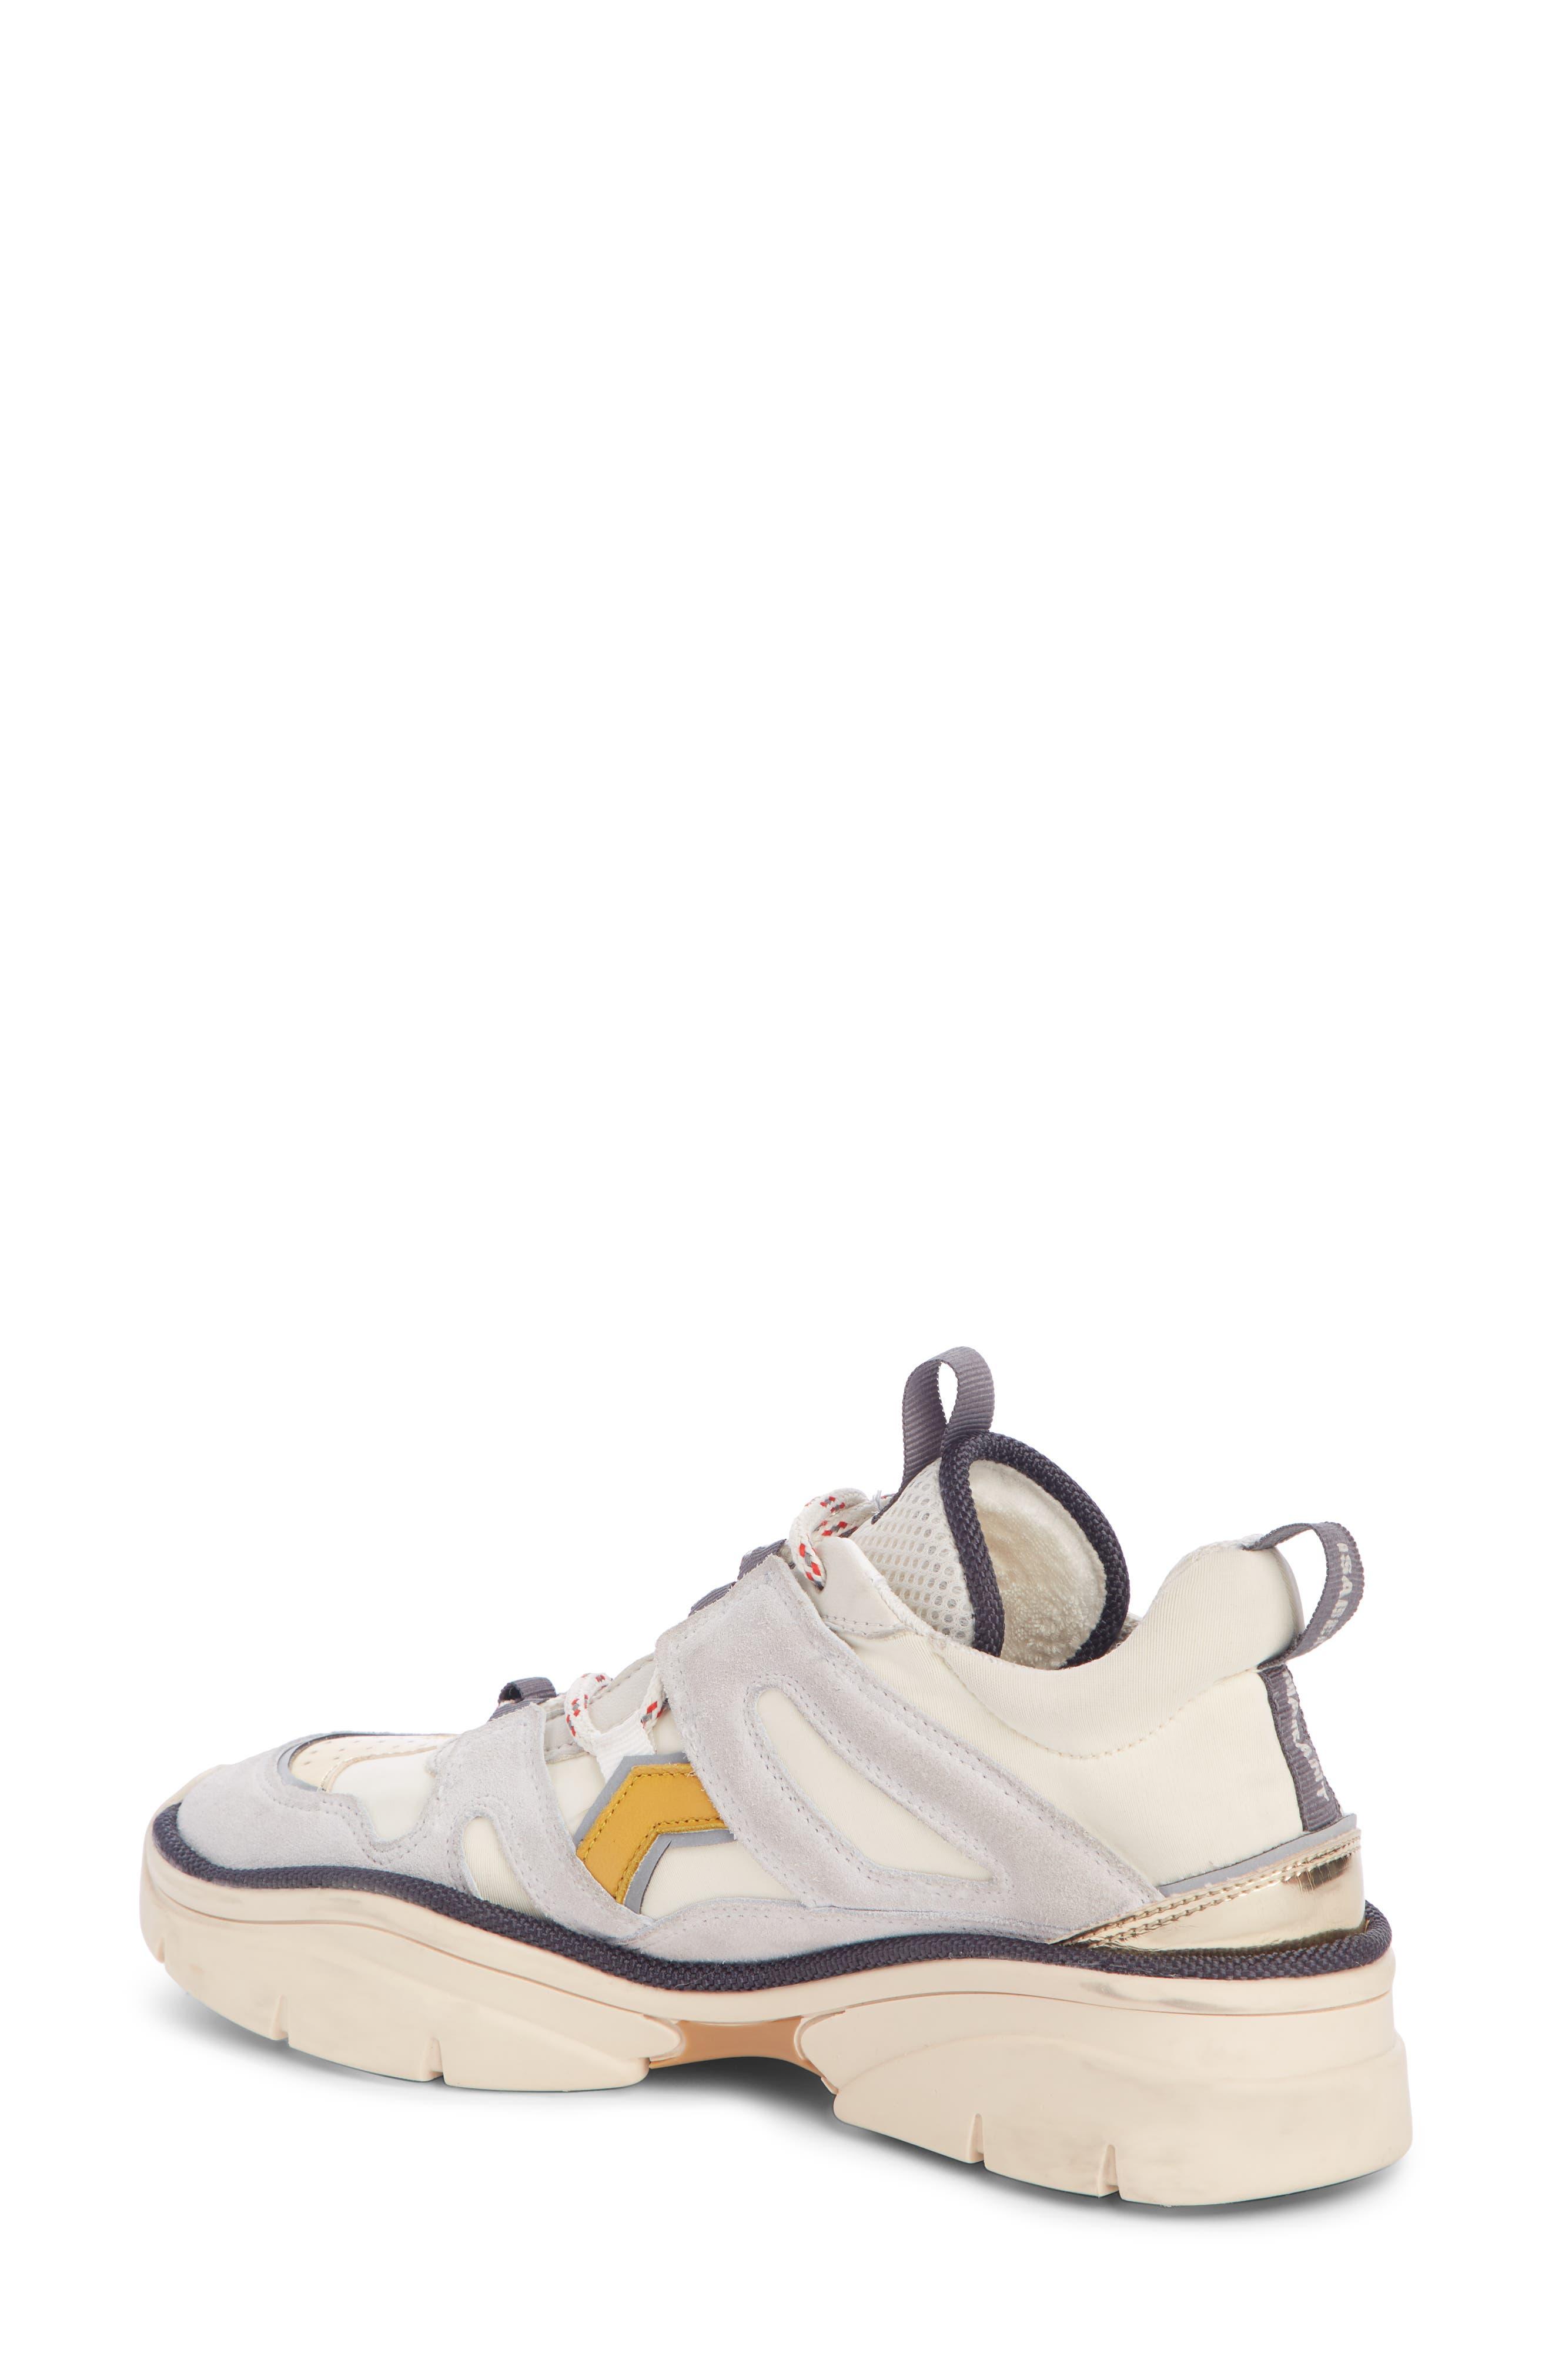 Kindsay Lace-Up Sneaker,                             Alternate thumbnail 2, color,                             WHITE